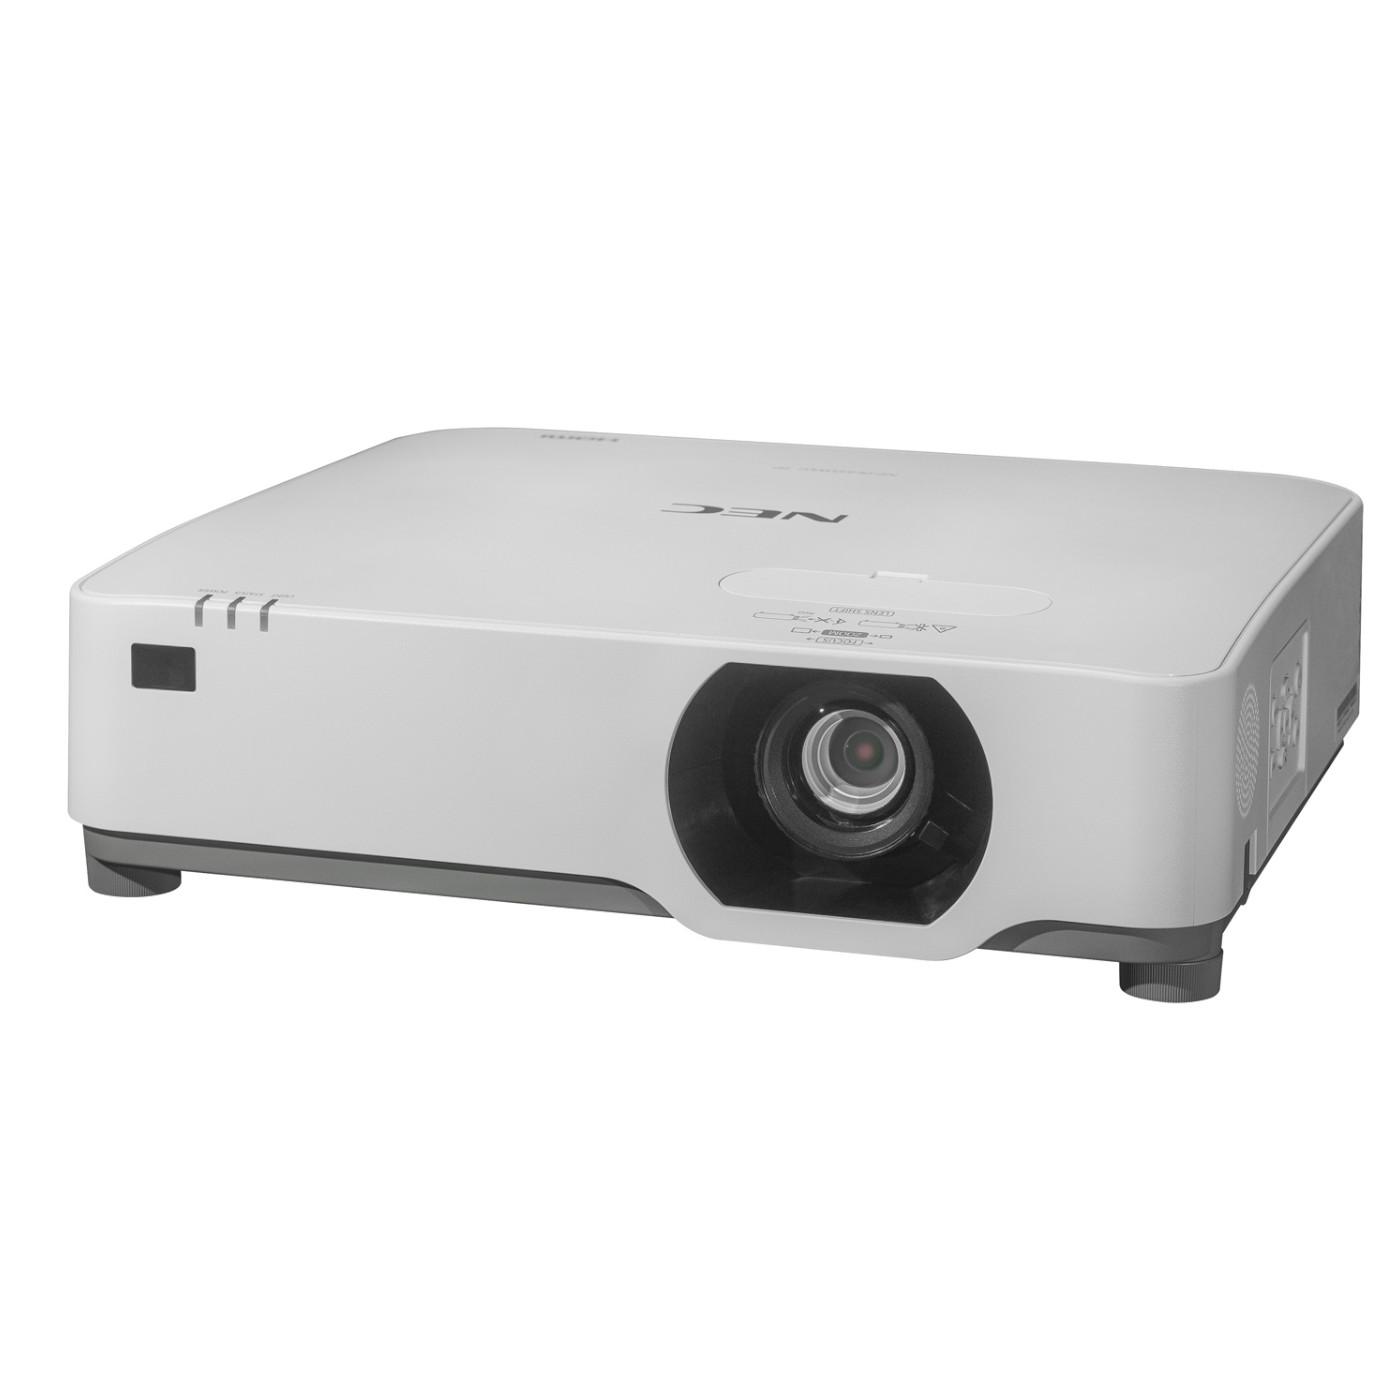 Проектор NEC 60004913 PE455WL-2